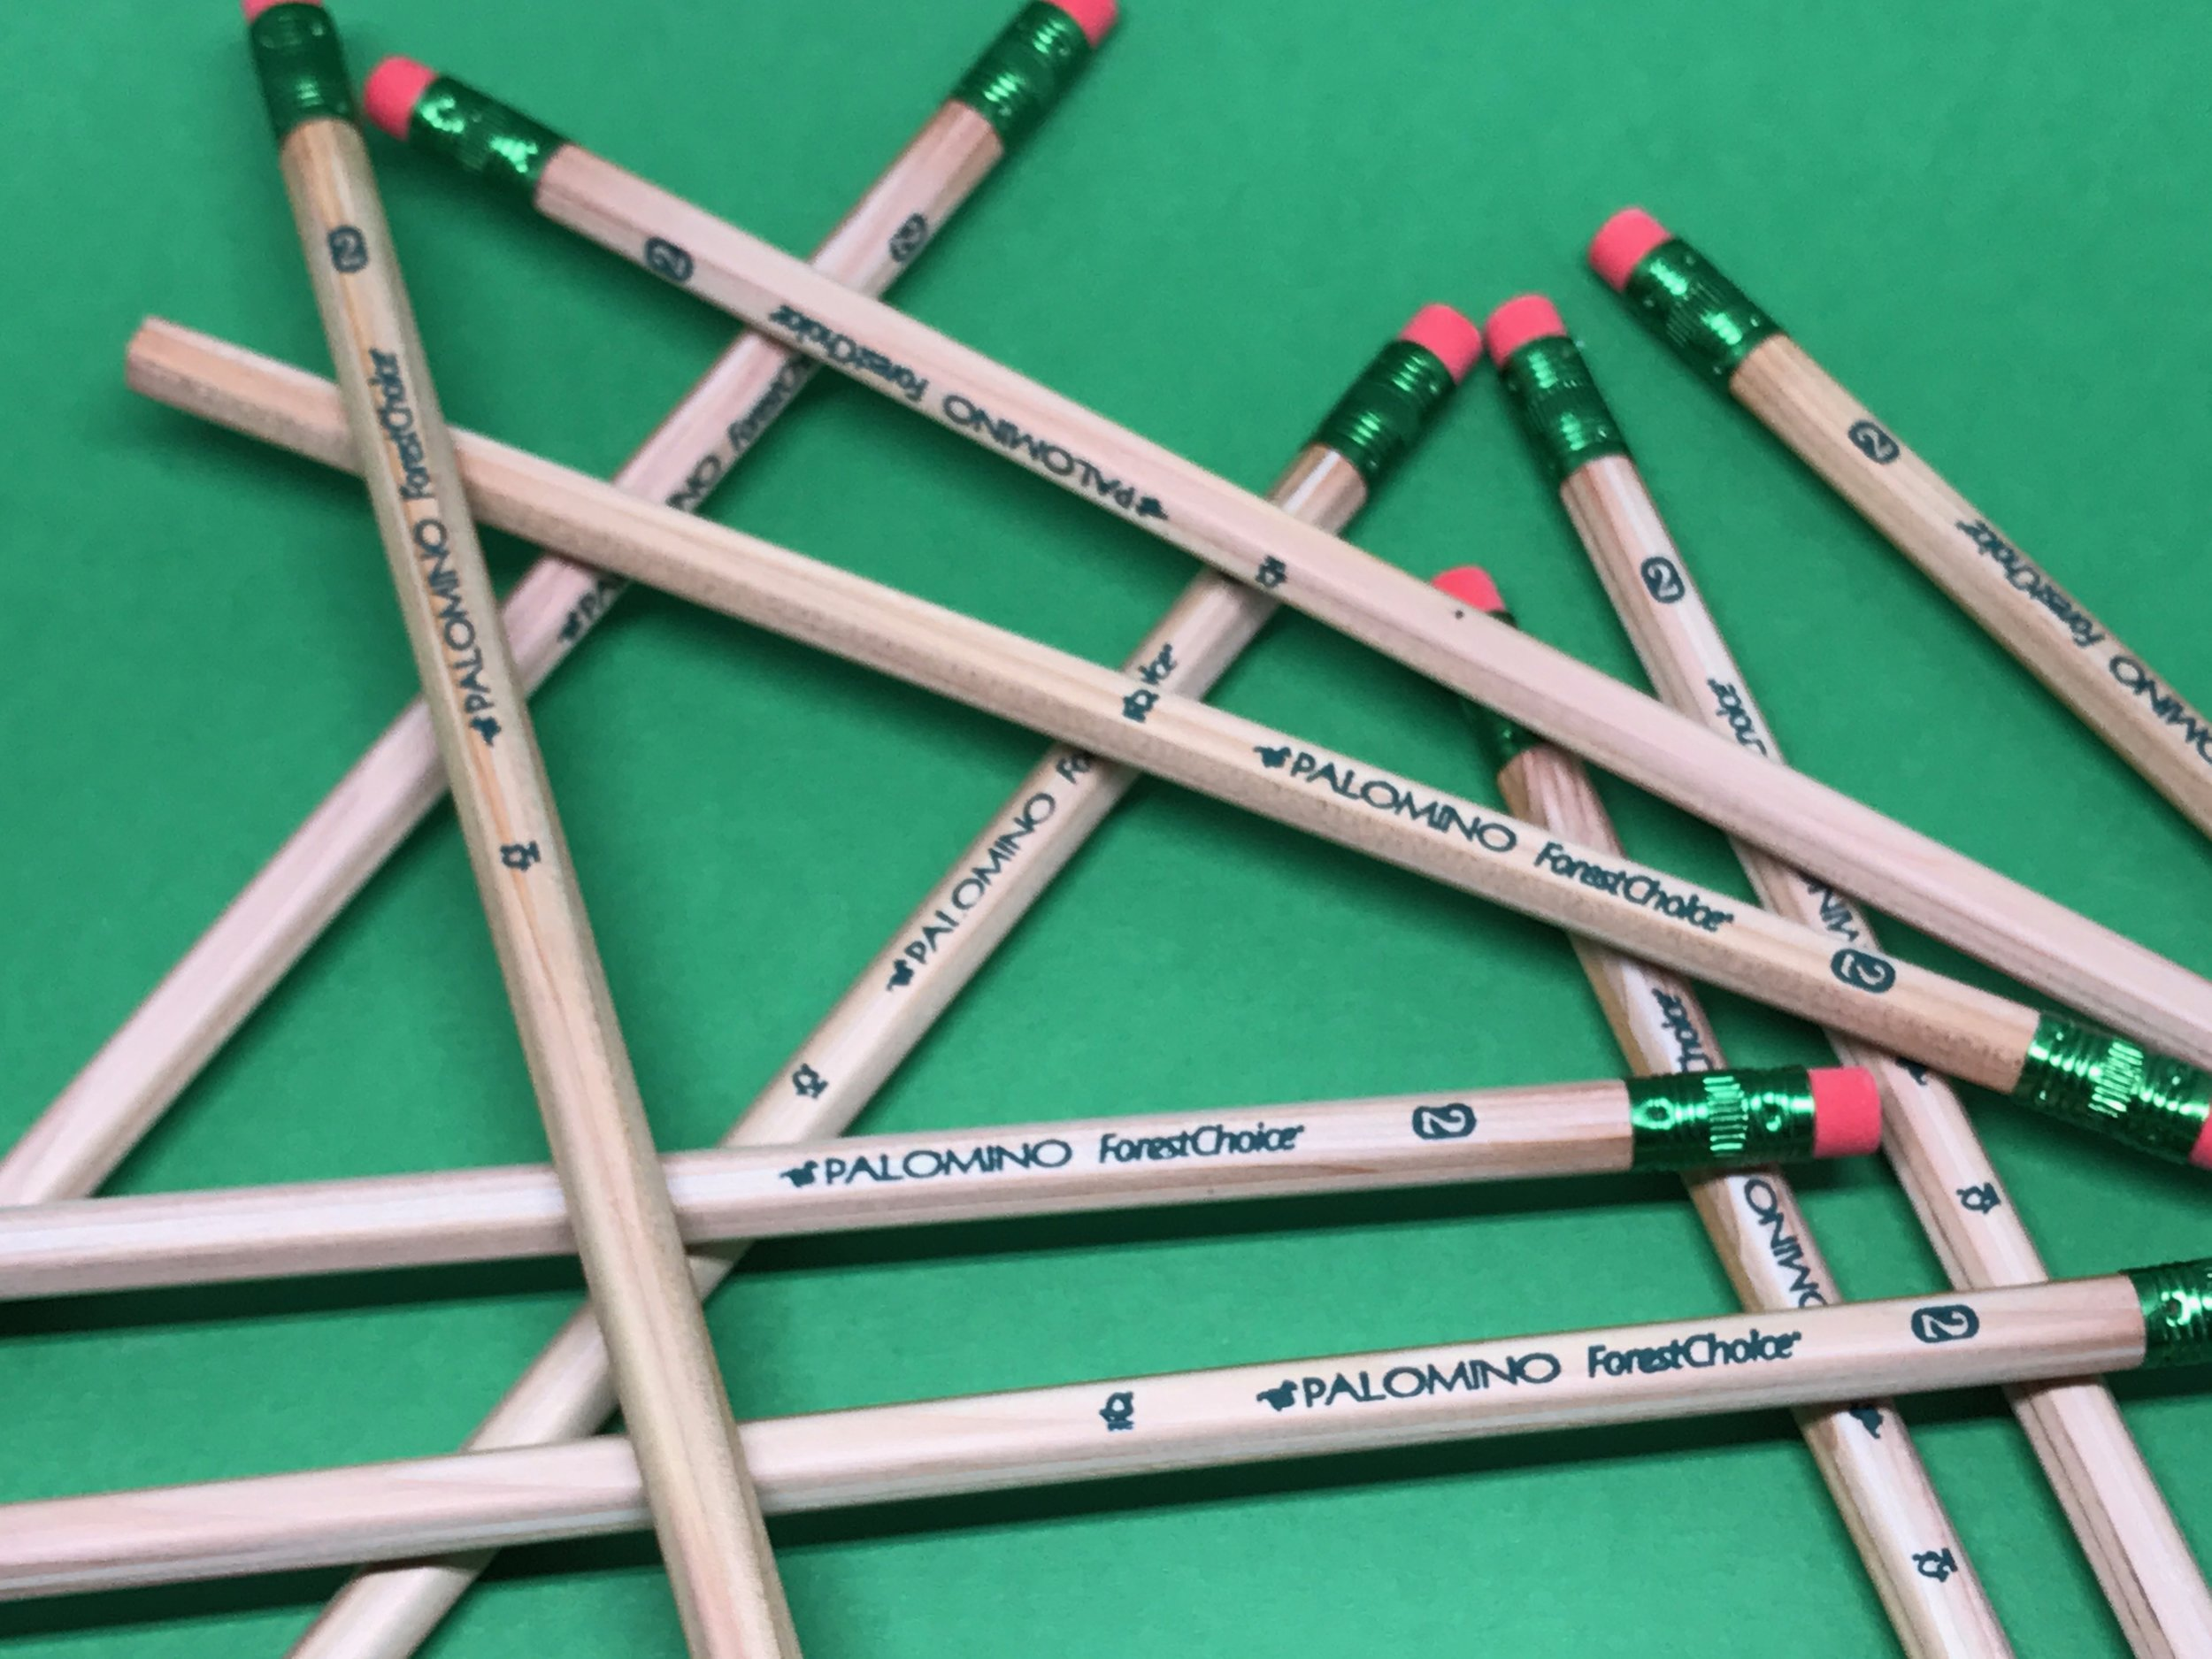 palomino-forest-choice-pencil-13.jpg